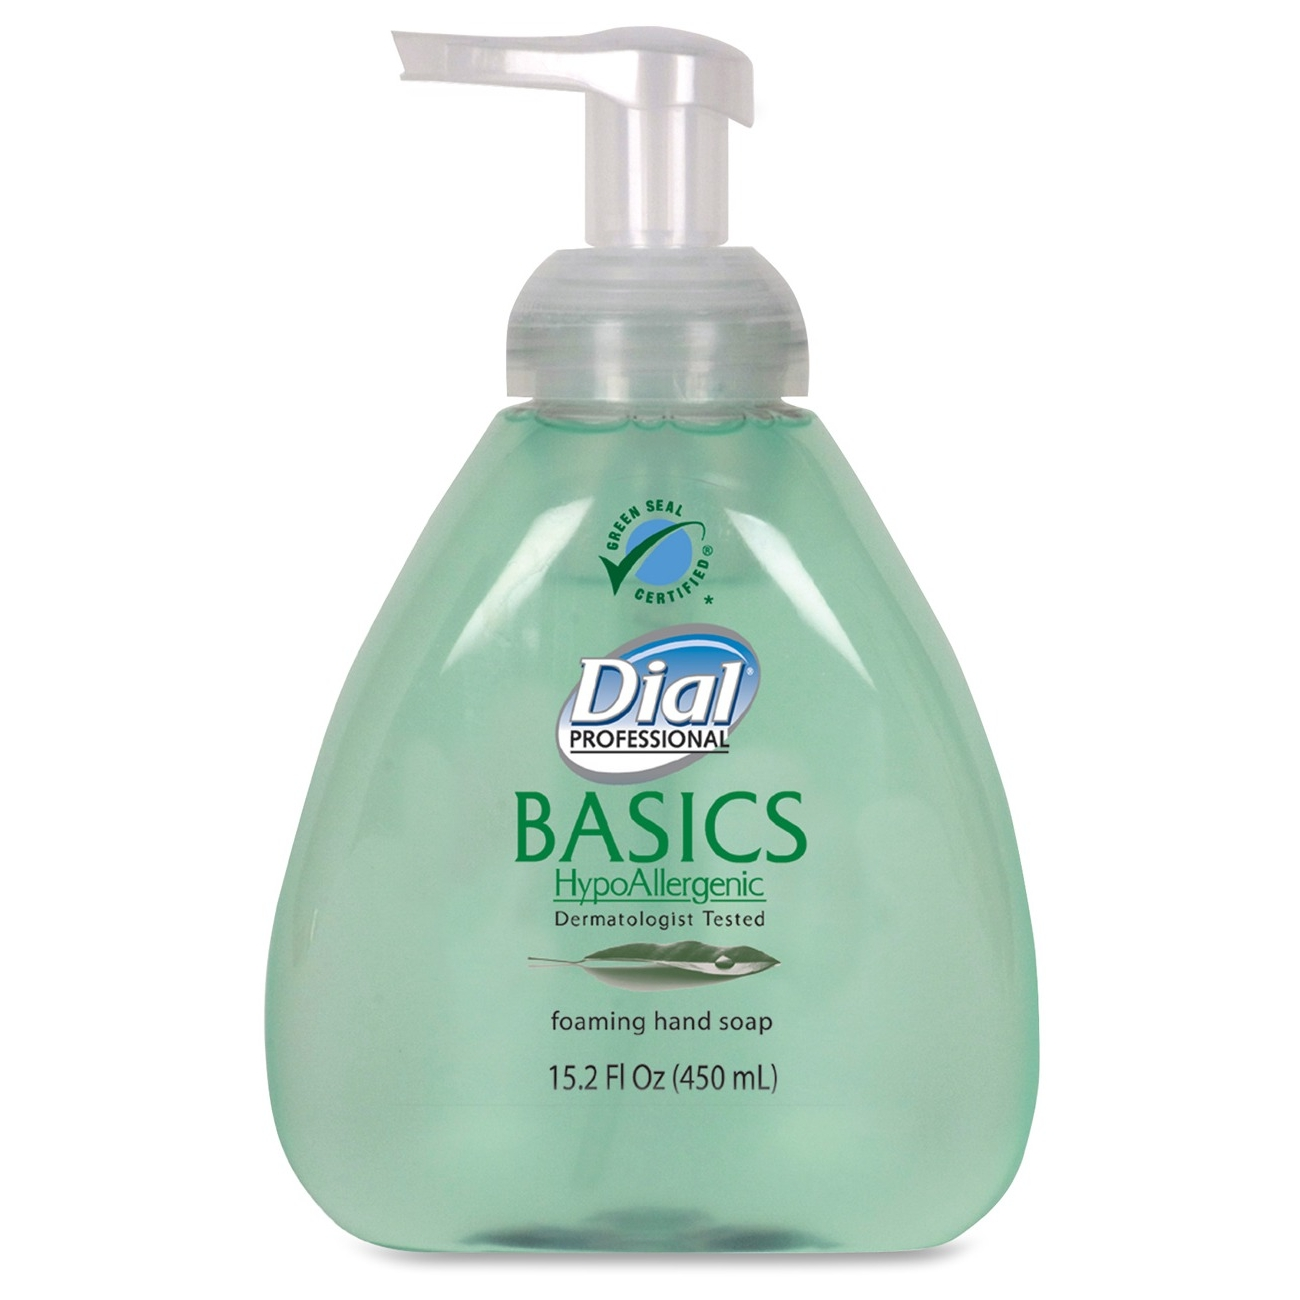 Dial Basics Foaming Soap W/ Aloe - Fresh Scent Scent - 15.20 Oz - Pump Bottle Dispenser - Hypoallergenic - Green - 4 / Carton (98609ct)